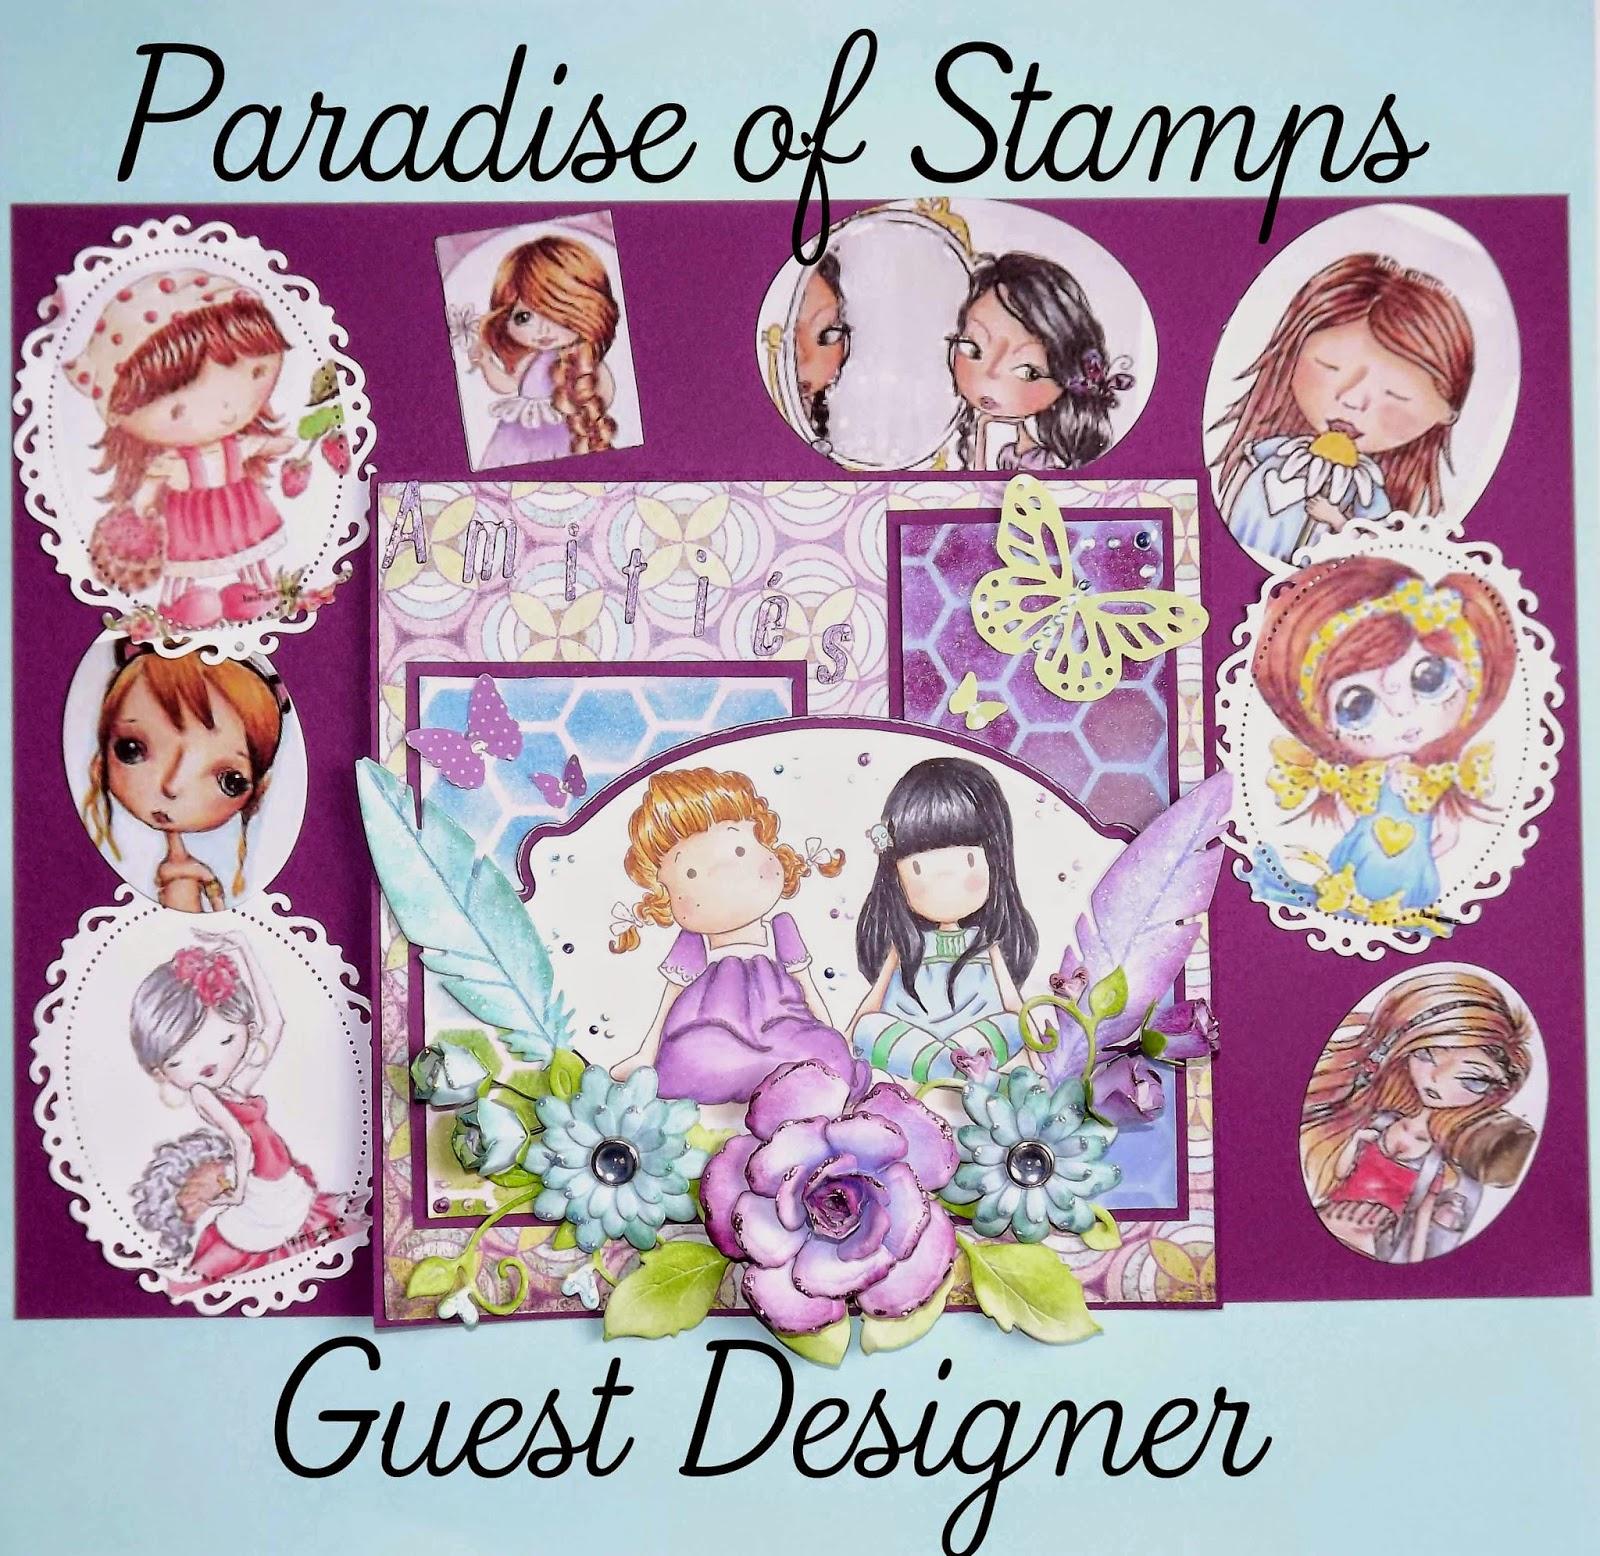 Guest Designer Fabruary 2016